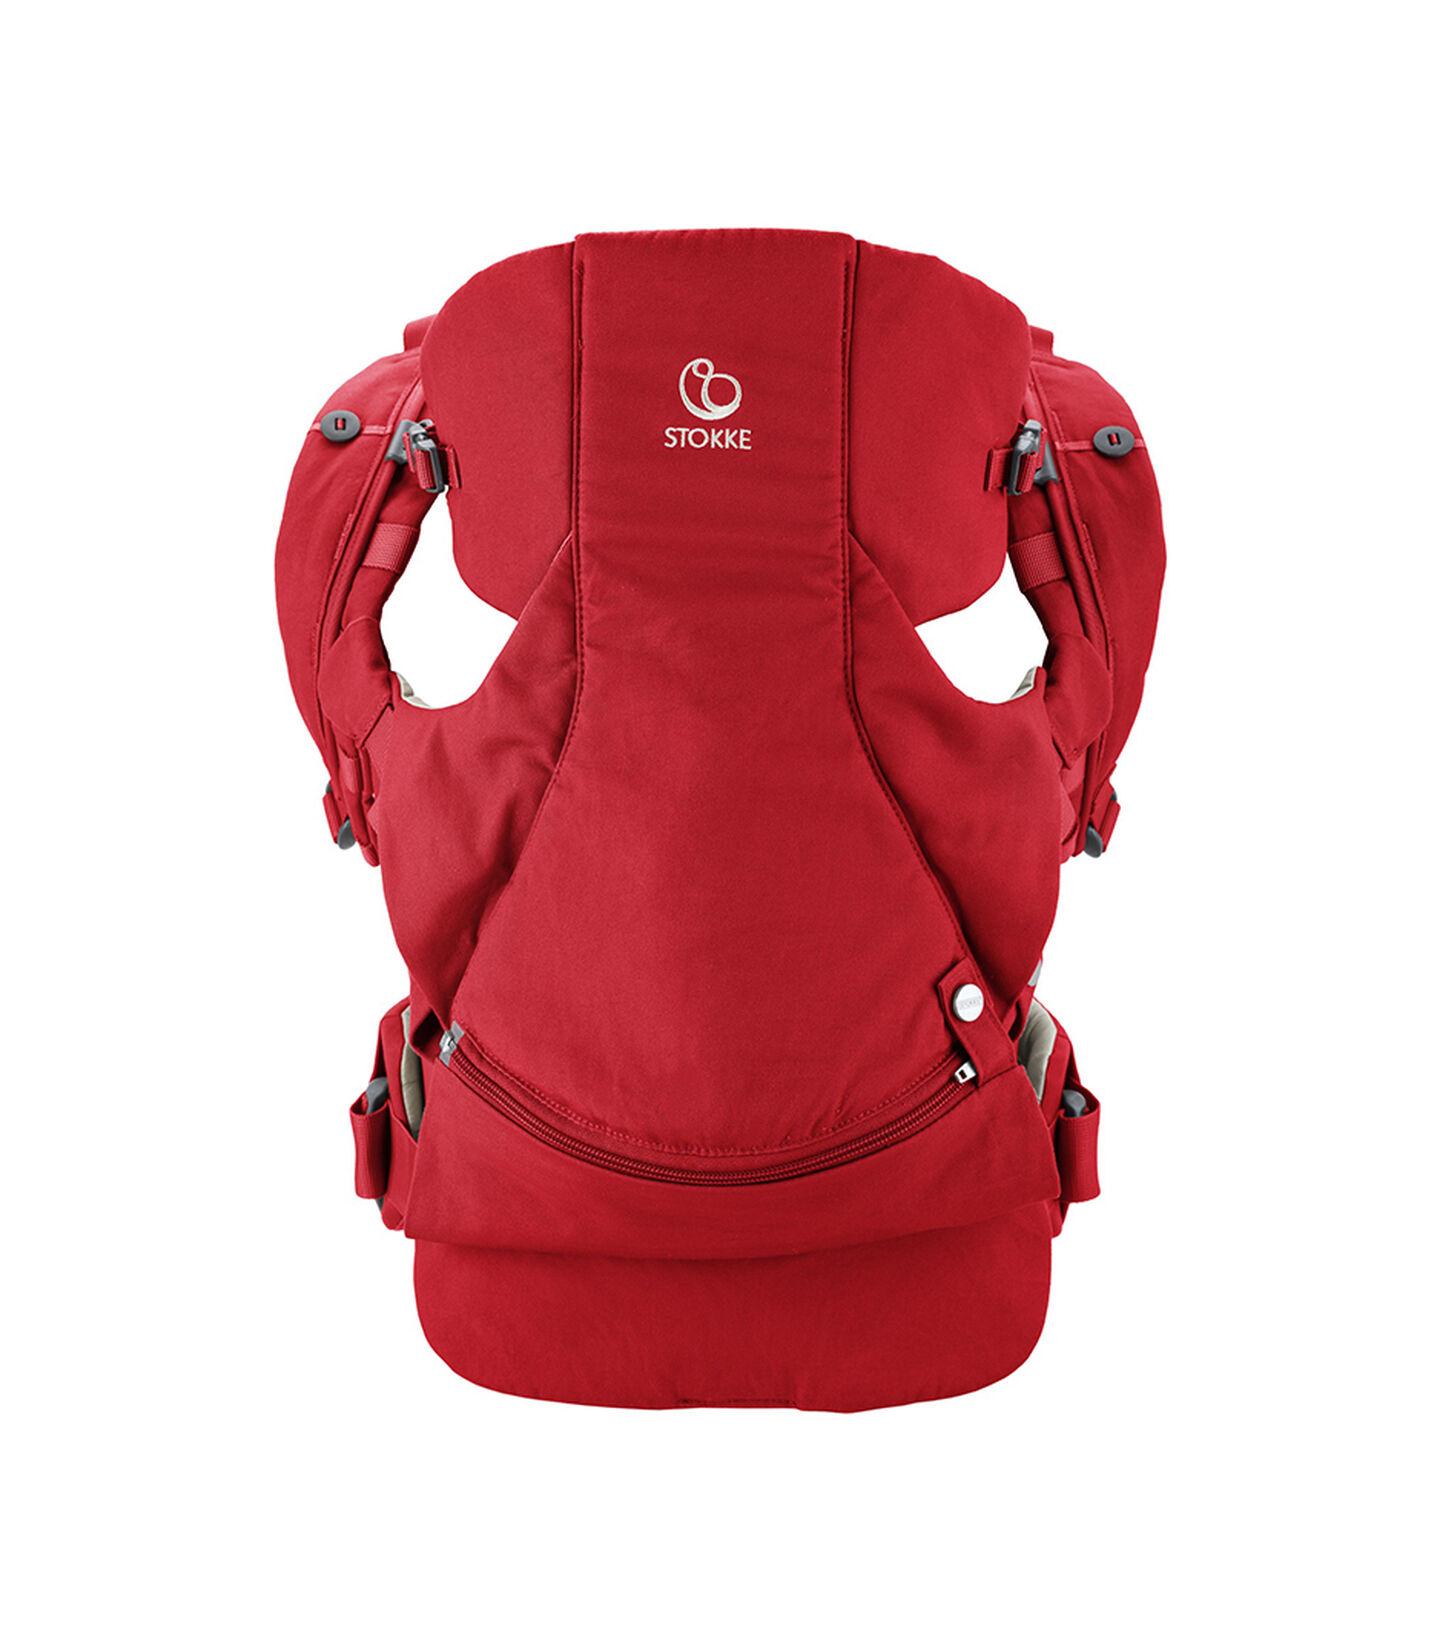 Stokke® MyCarrier™ 前向式背帶紅色, 紅色, mainview view 2